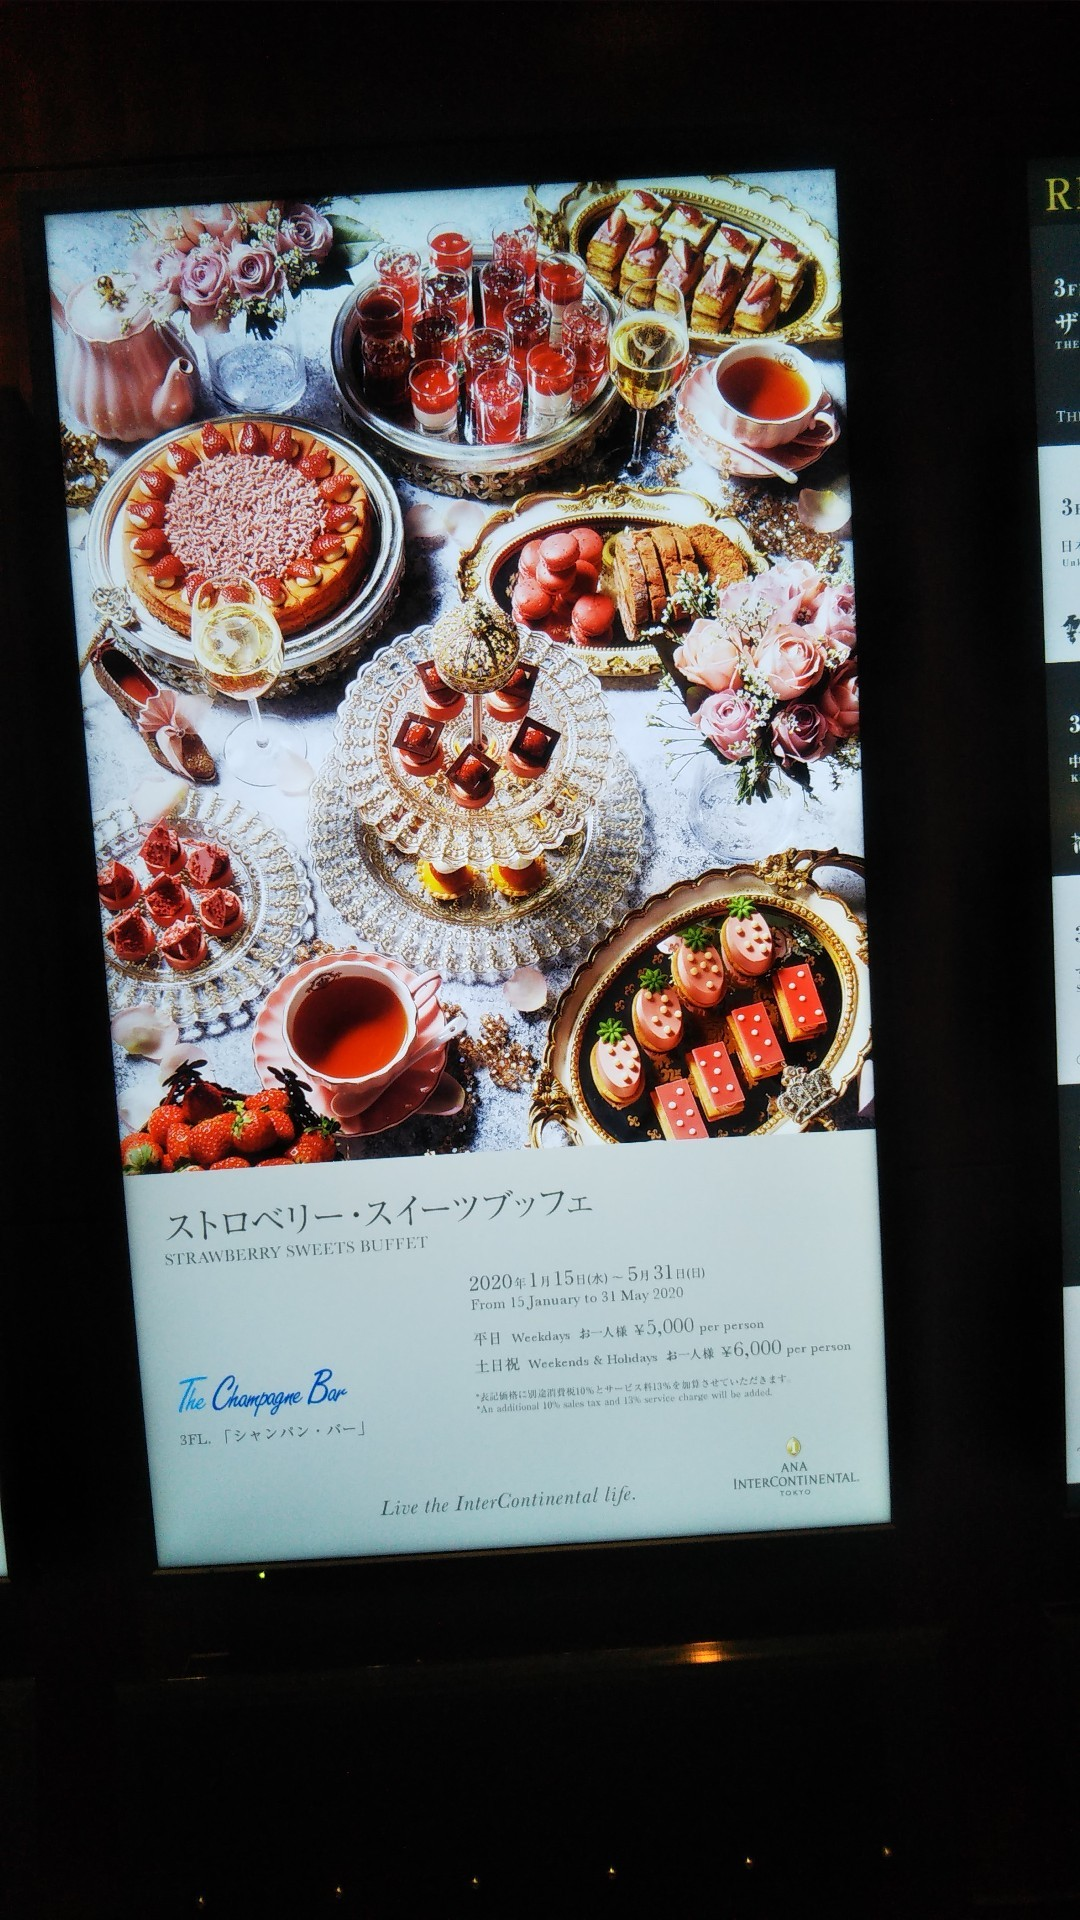 ANAインターコンチネンタルホテル東京 シャンパン・バー チョコレート・スイーツブッフェ_f0076001_22035896.jpg